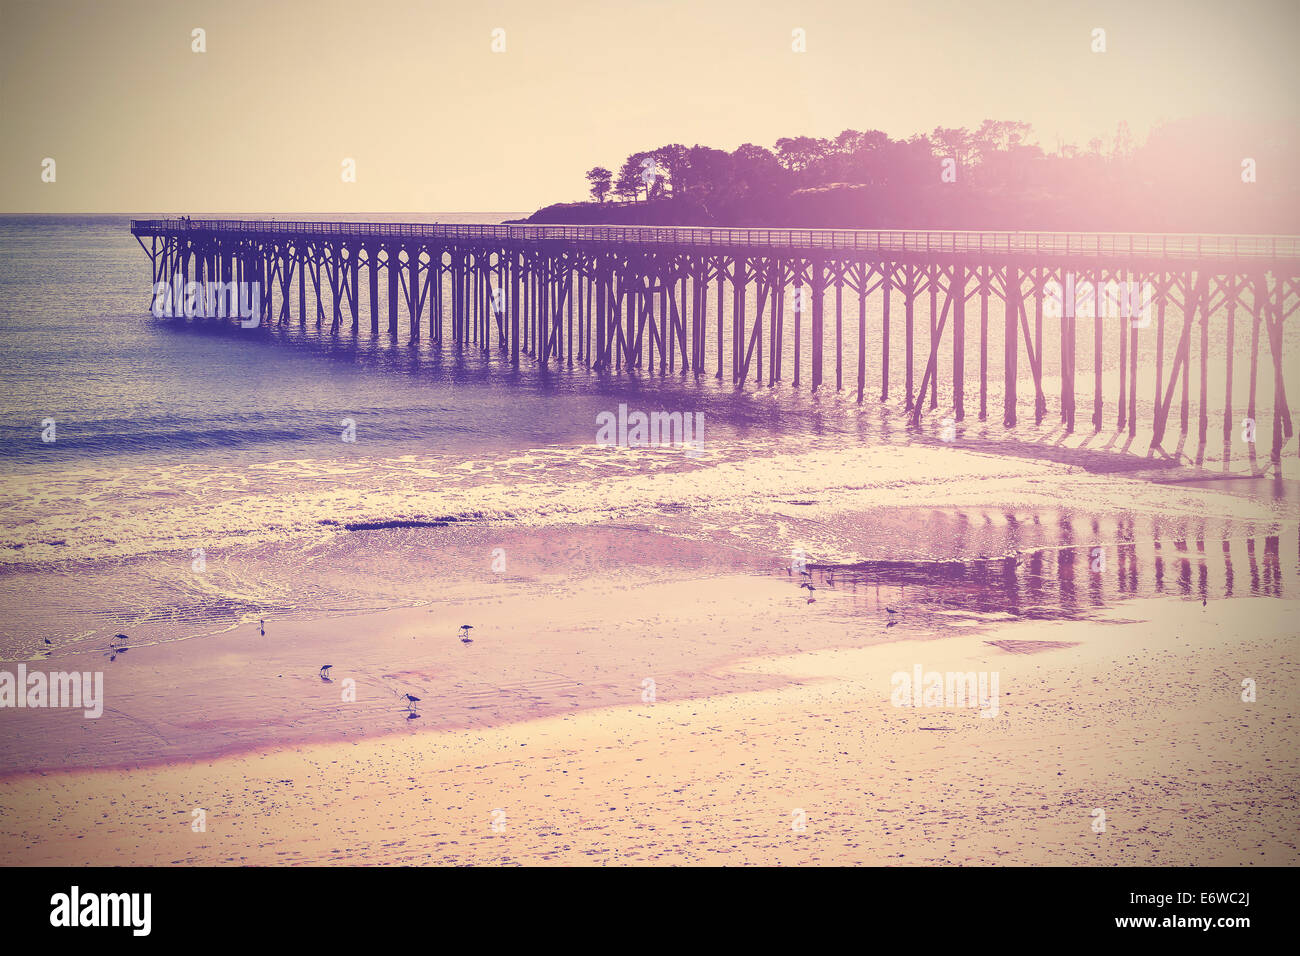 Vintage wood bridge at beach sunset, California, USA. - Stock Image